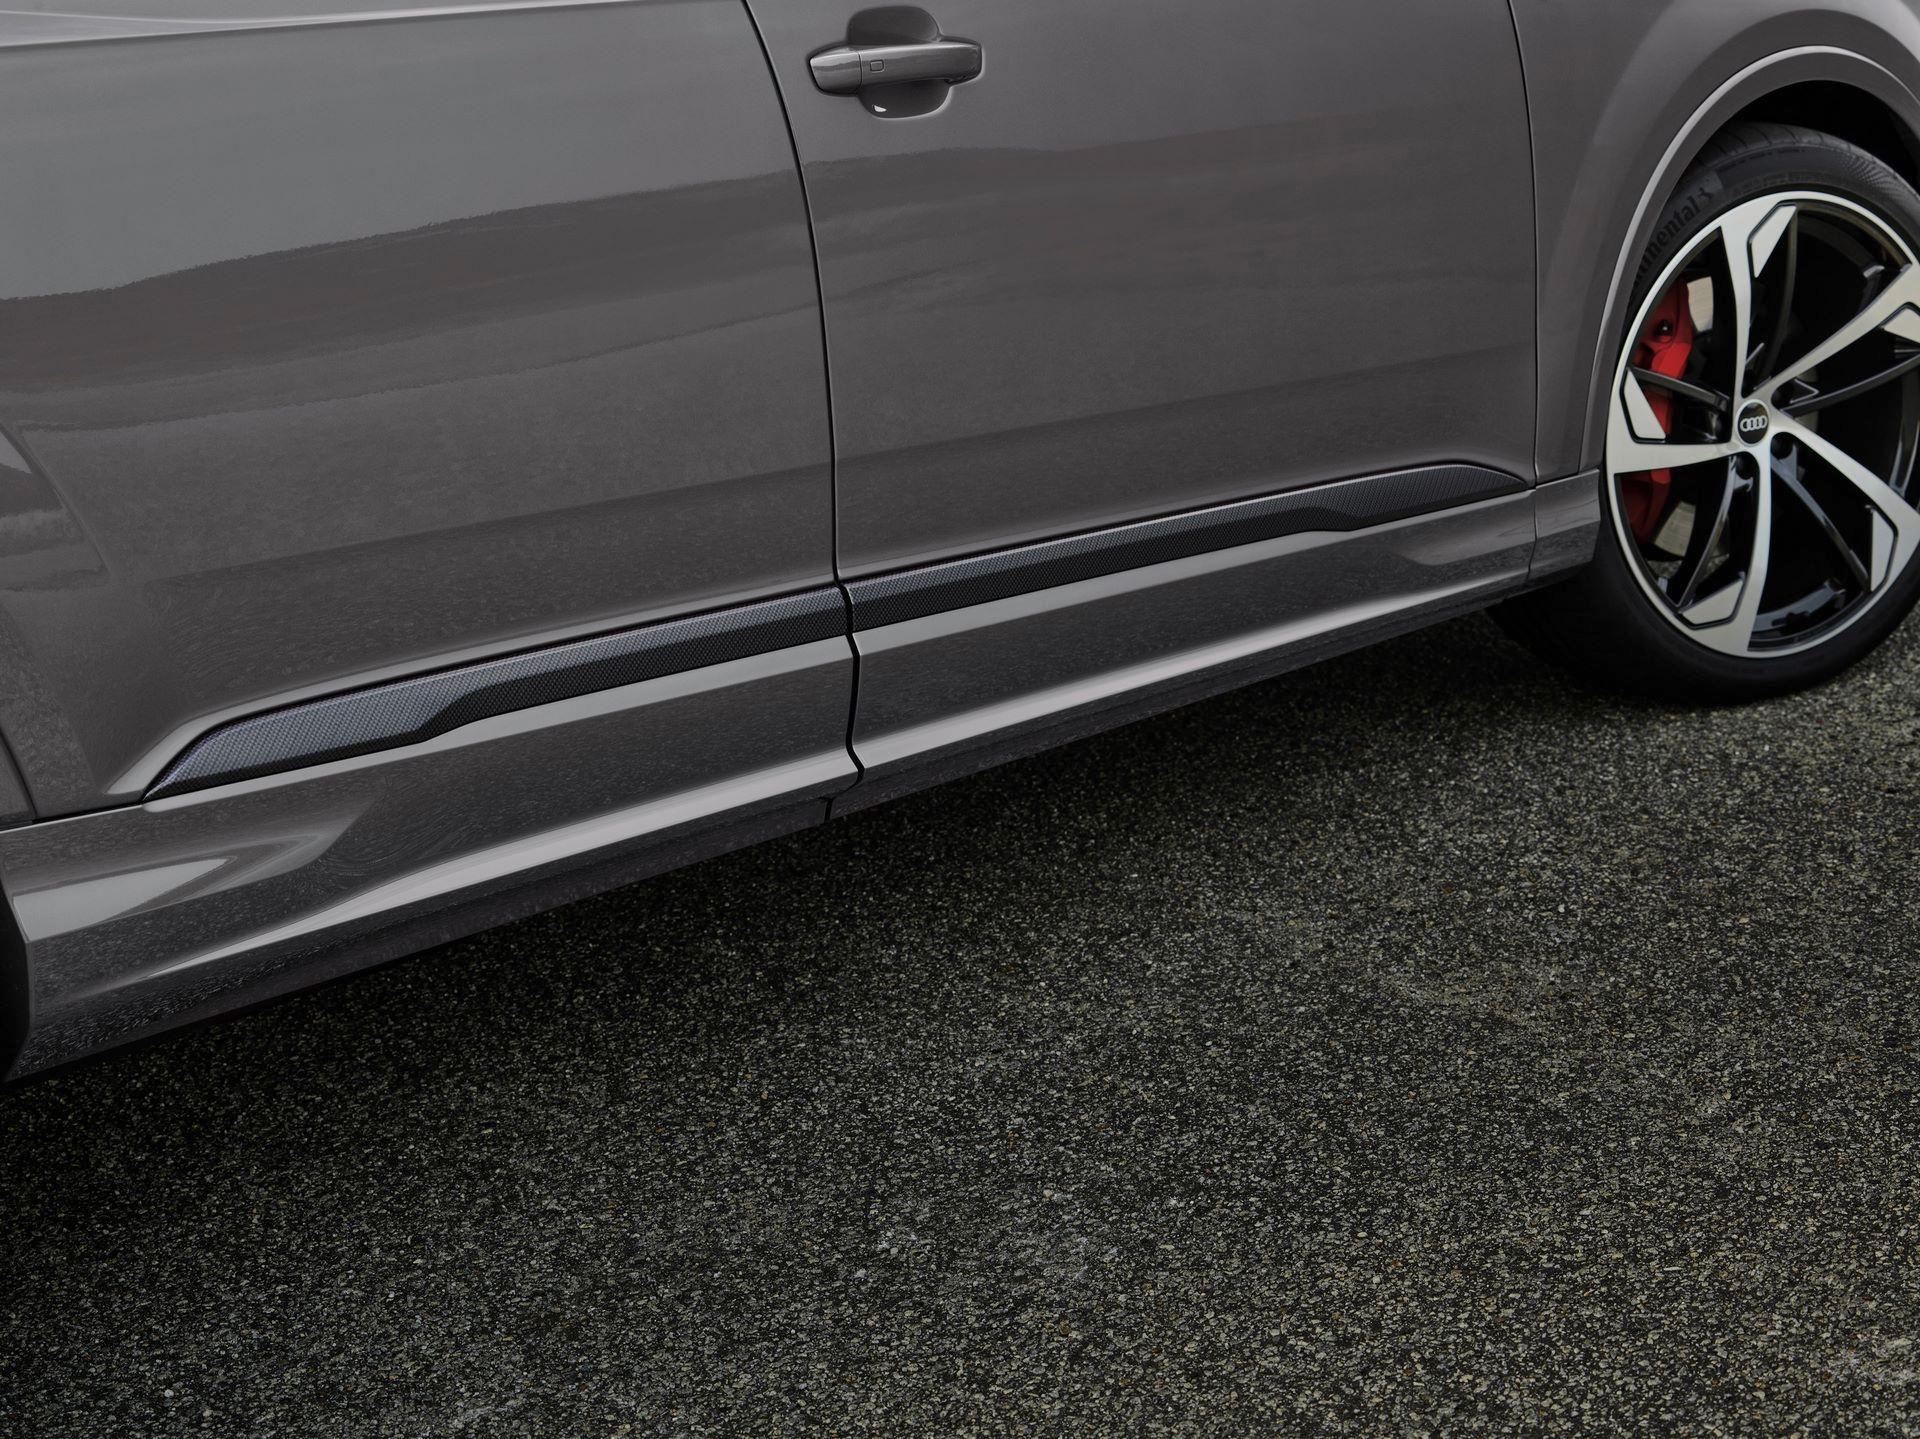 Audi-A4-A5-Q7-Q8-Competition-And-Competition-Plus-Trims-45